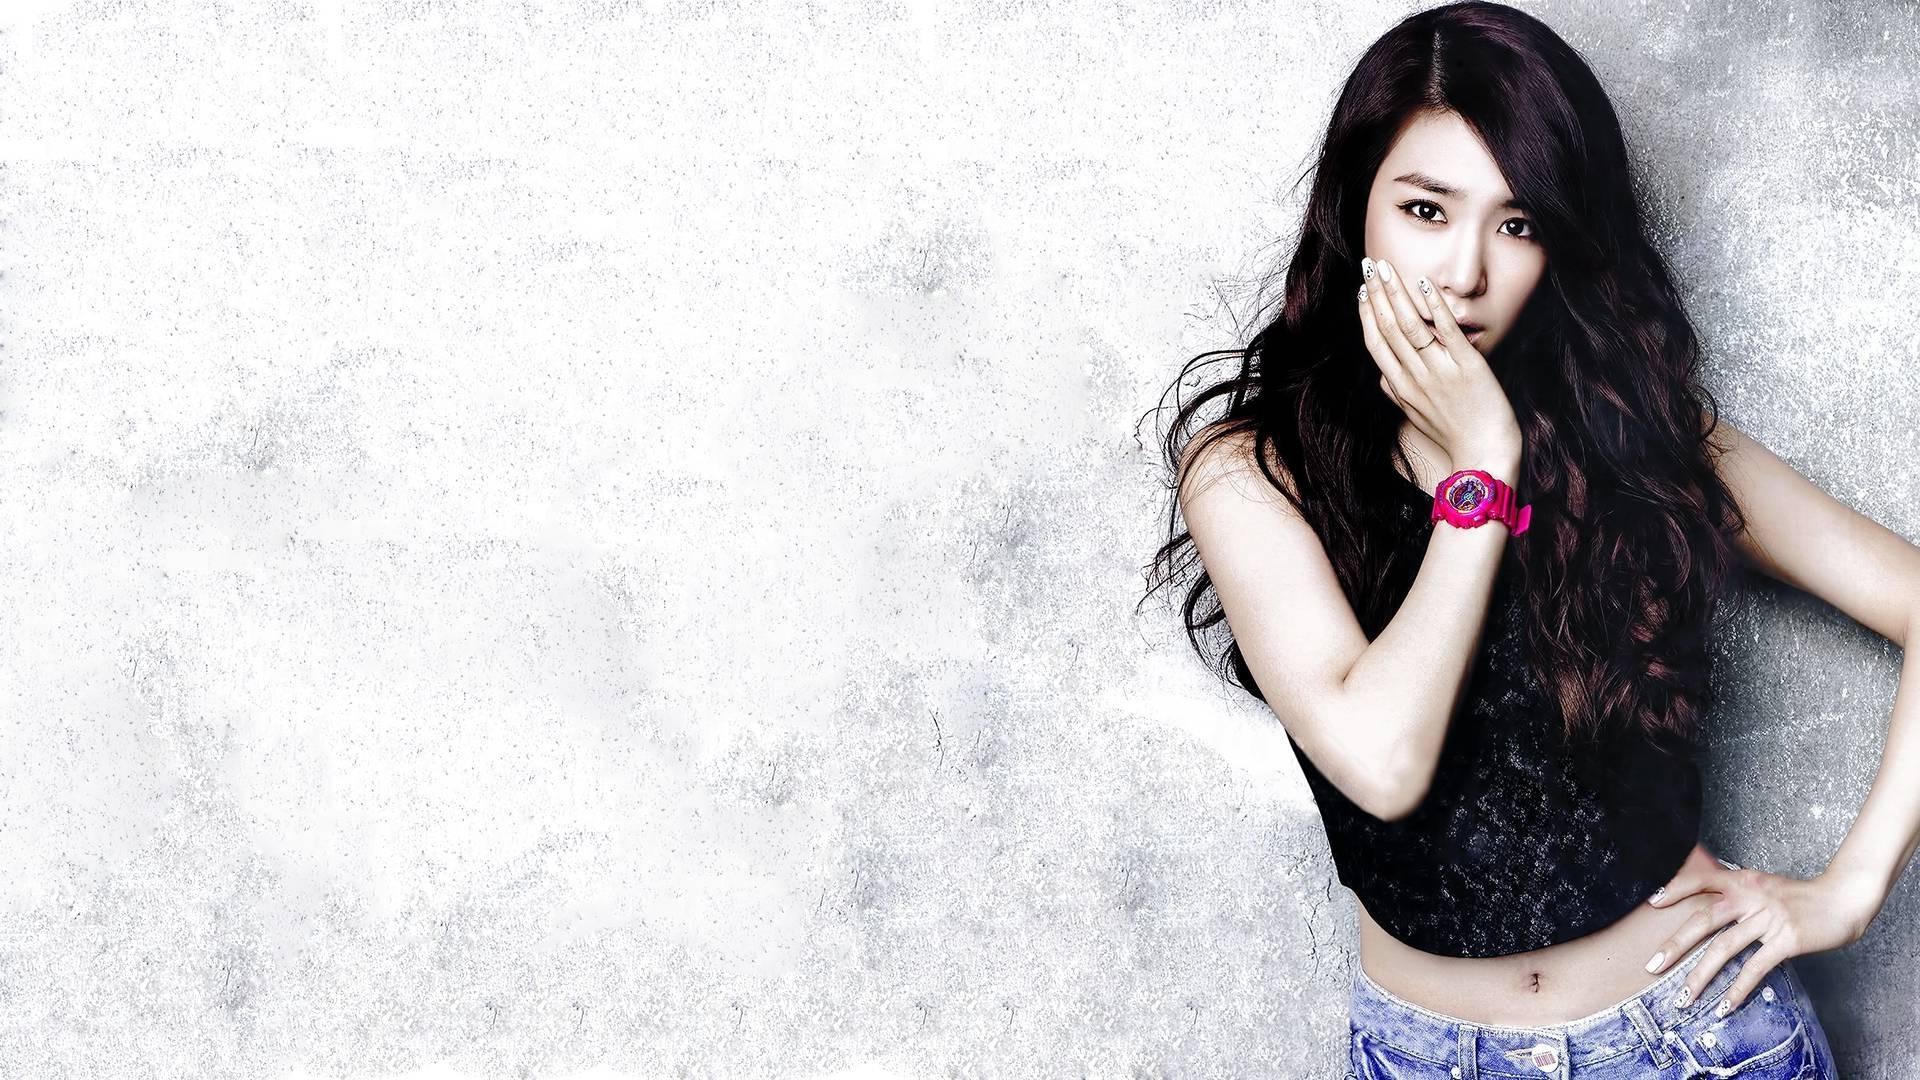 Asian, Snsd, Girls Generation, Musicians, Singer, Tiffany - Snsd Tiffany , HD Wallpaper & Backgrounds